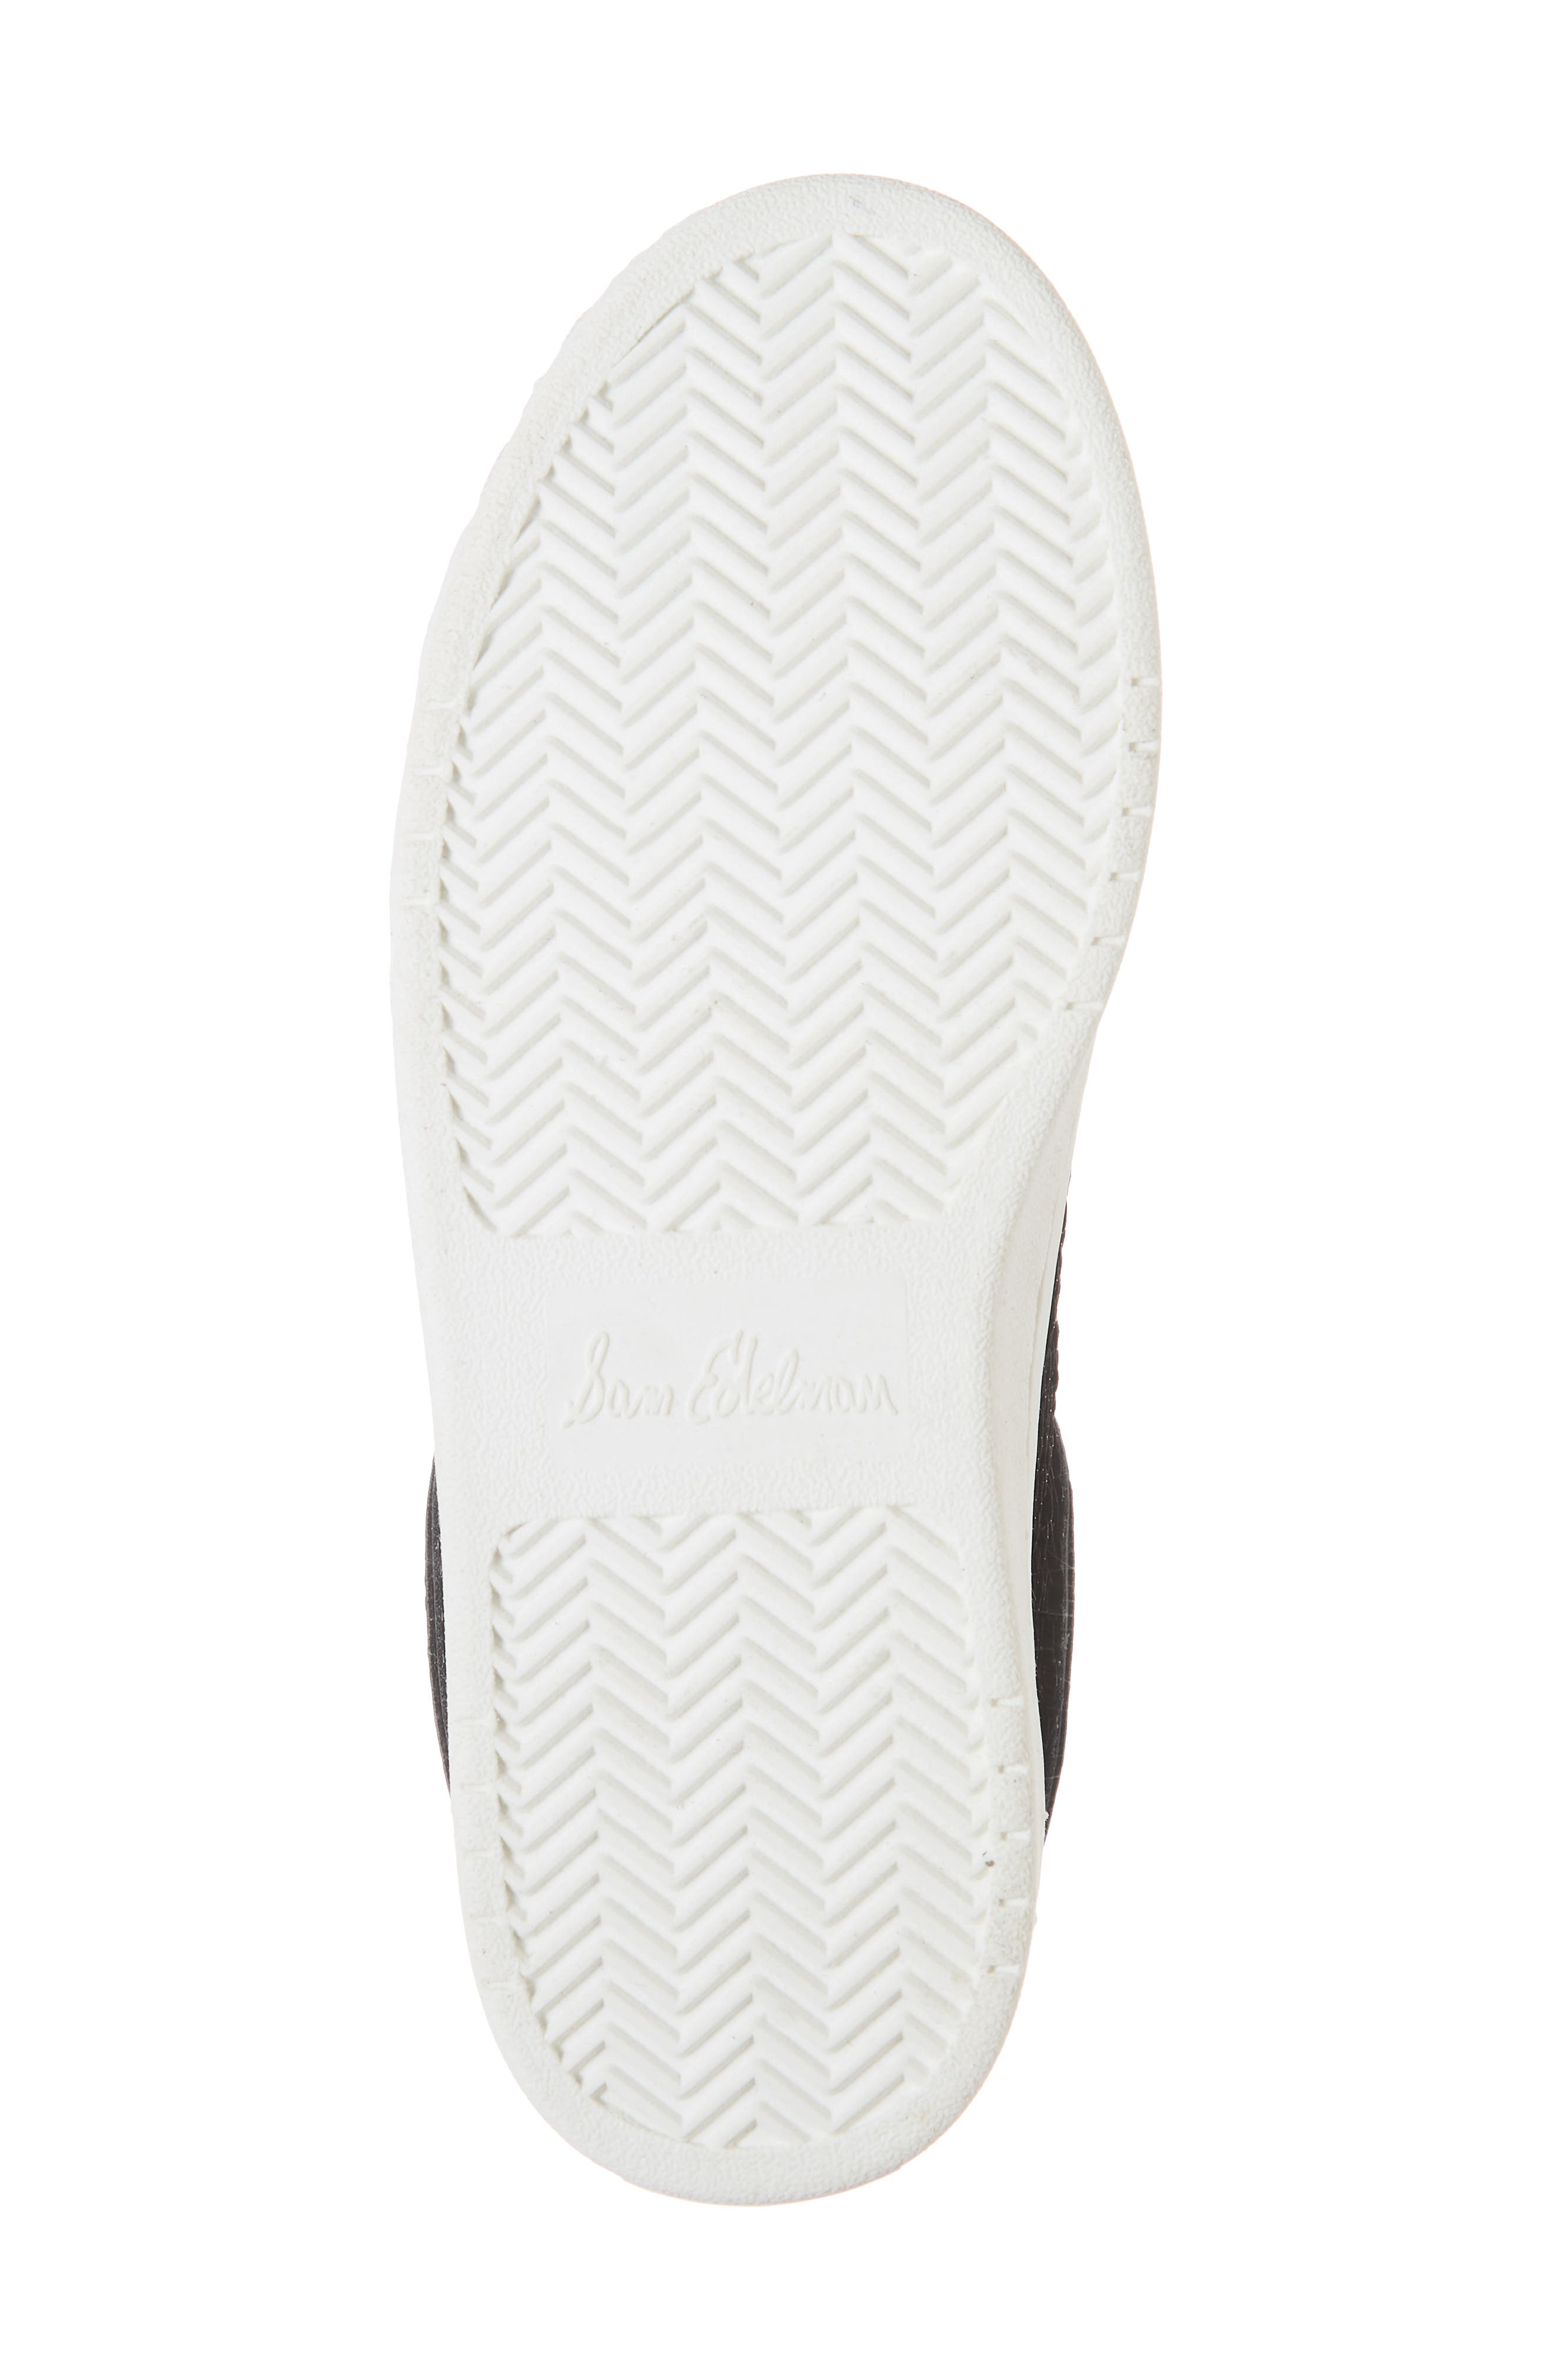 Blane Elizia Sequin Sneaker,                             Alternate thumbnail 6, color,                             BLACK SILVER